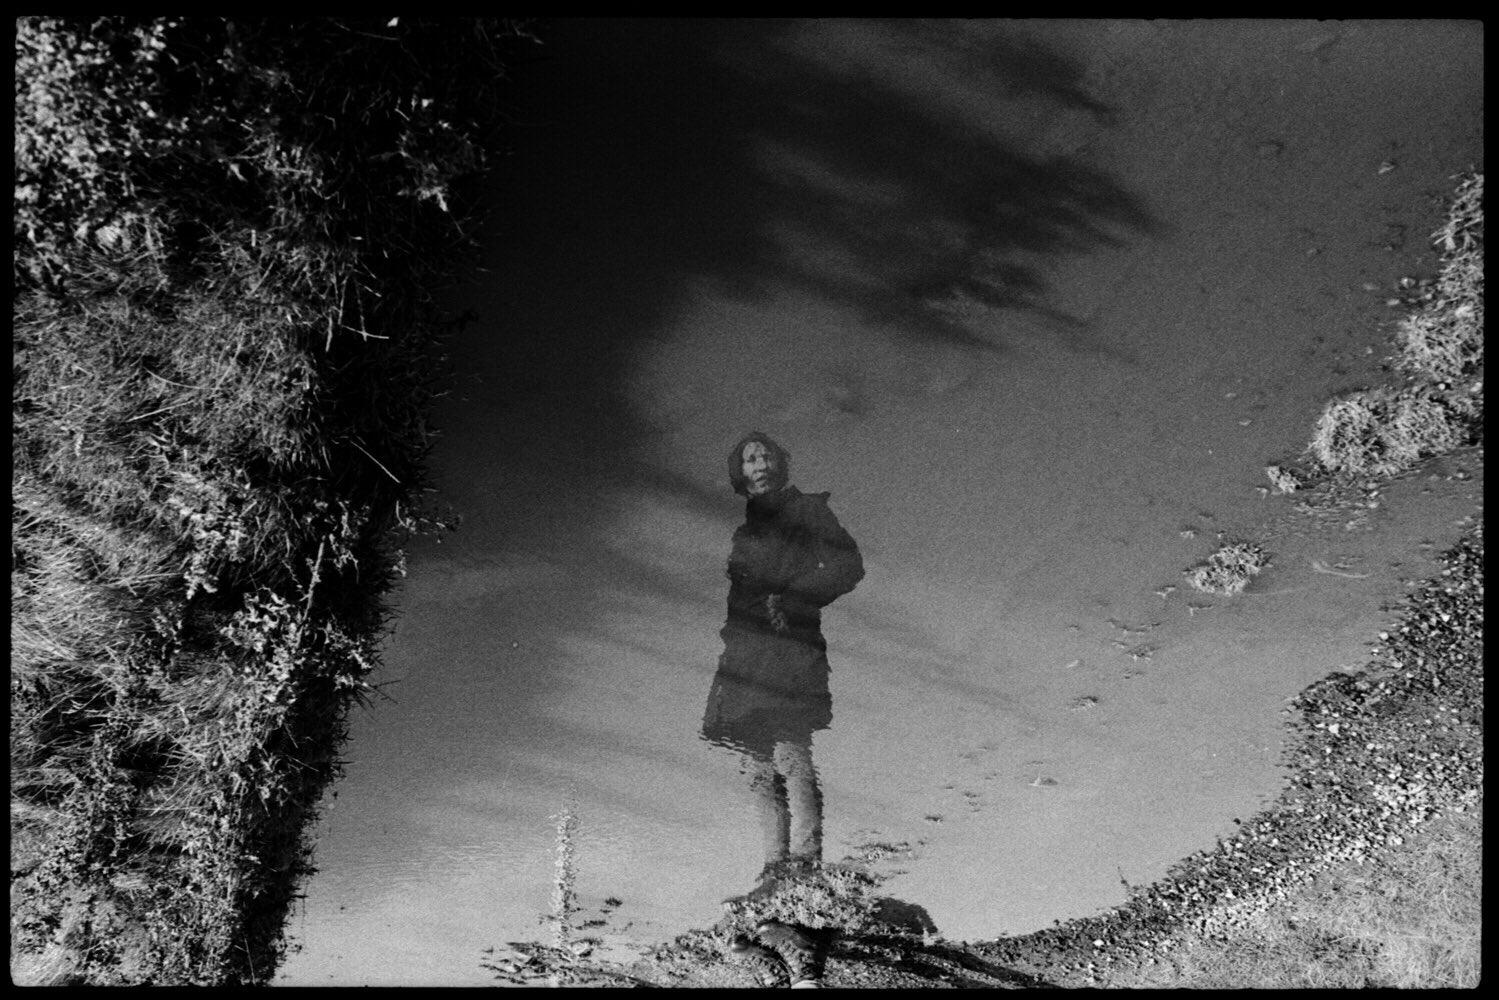 @markmoranphoto Canon P / Jupiter 8 / Ilford HP5 / Ilfotec HC #ilfordphoto #fridayfavourites #lightonfilm #believeinfilm #filmsnotdead #reflection